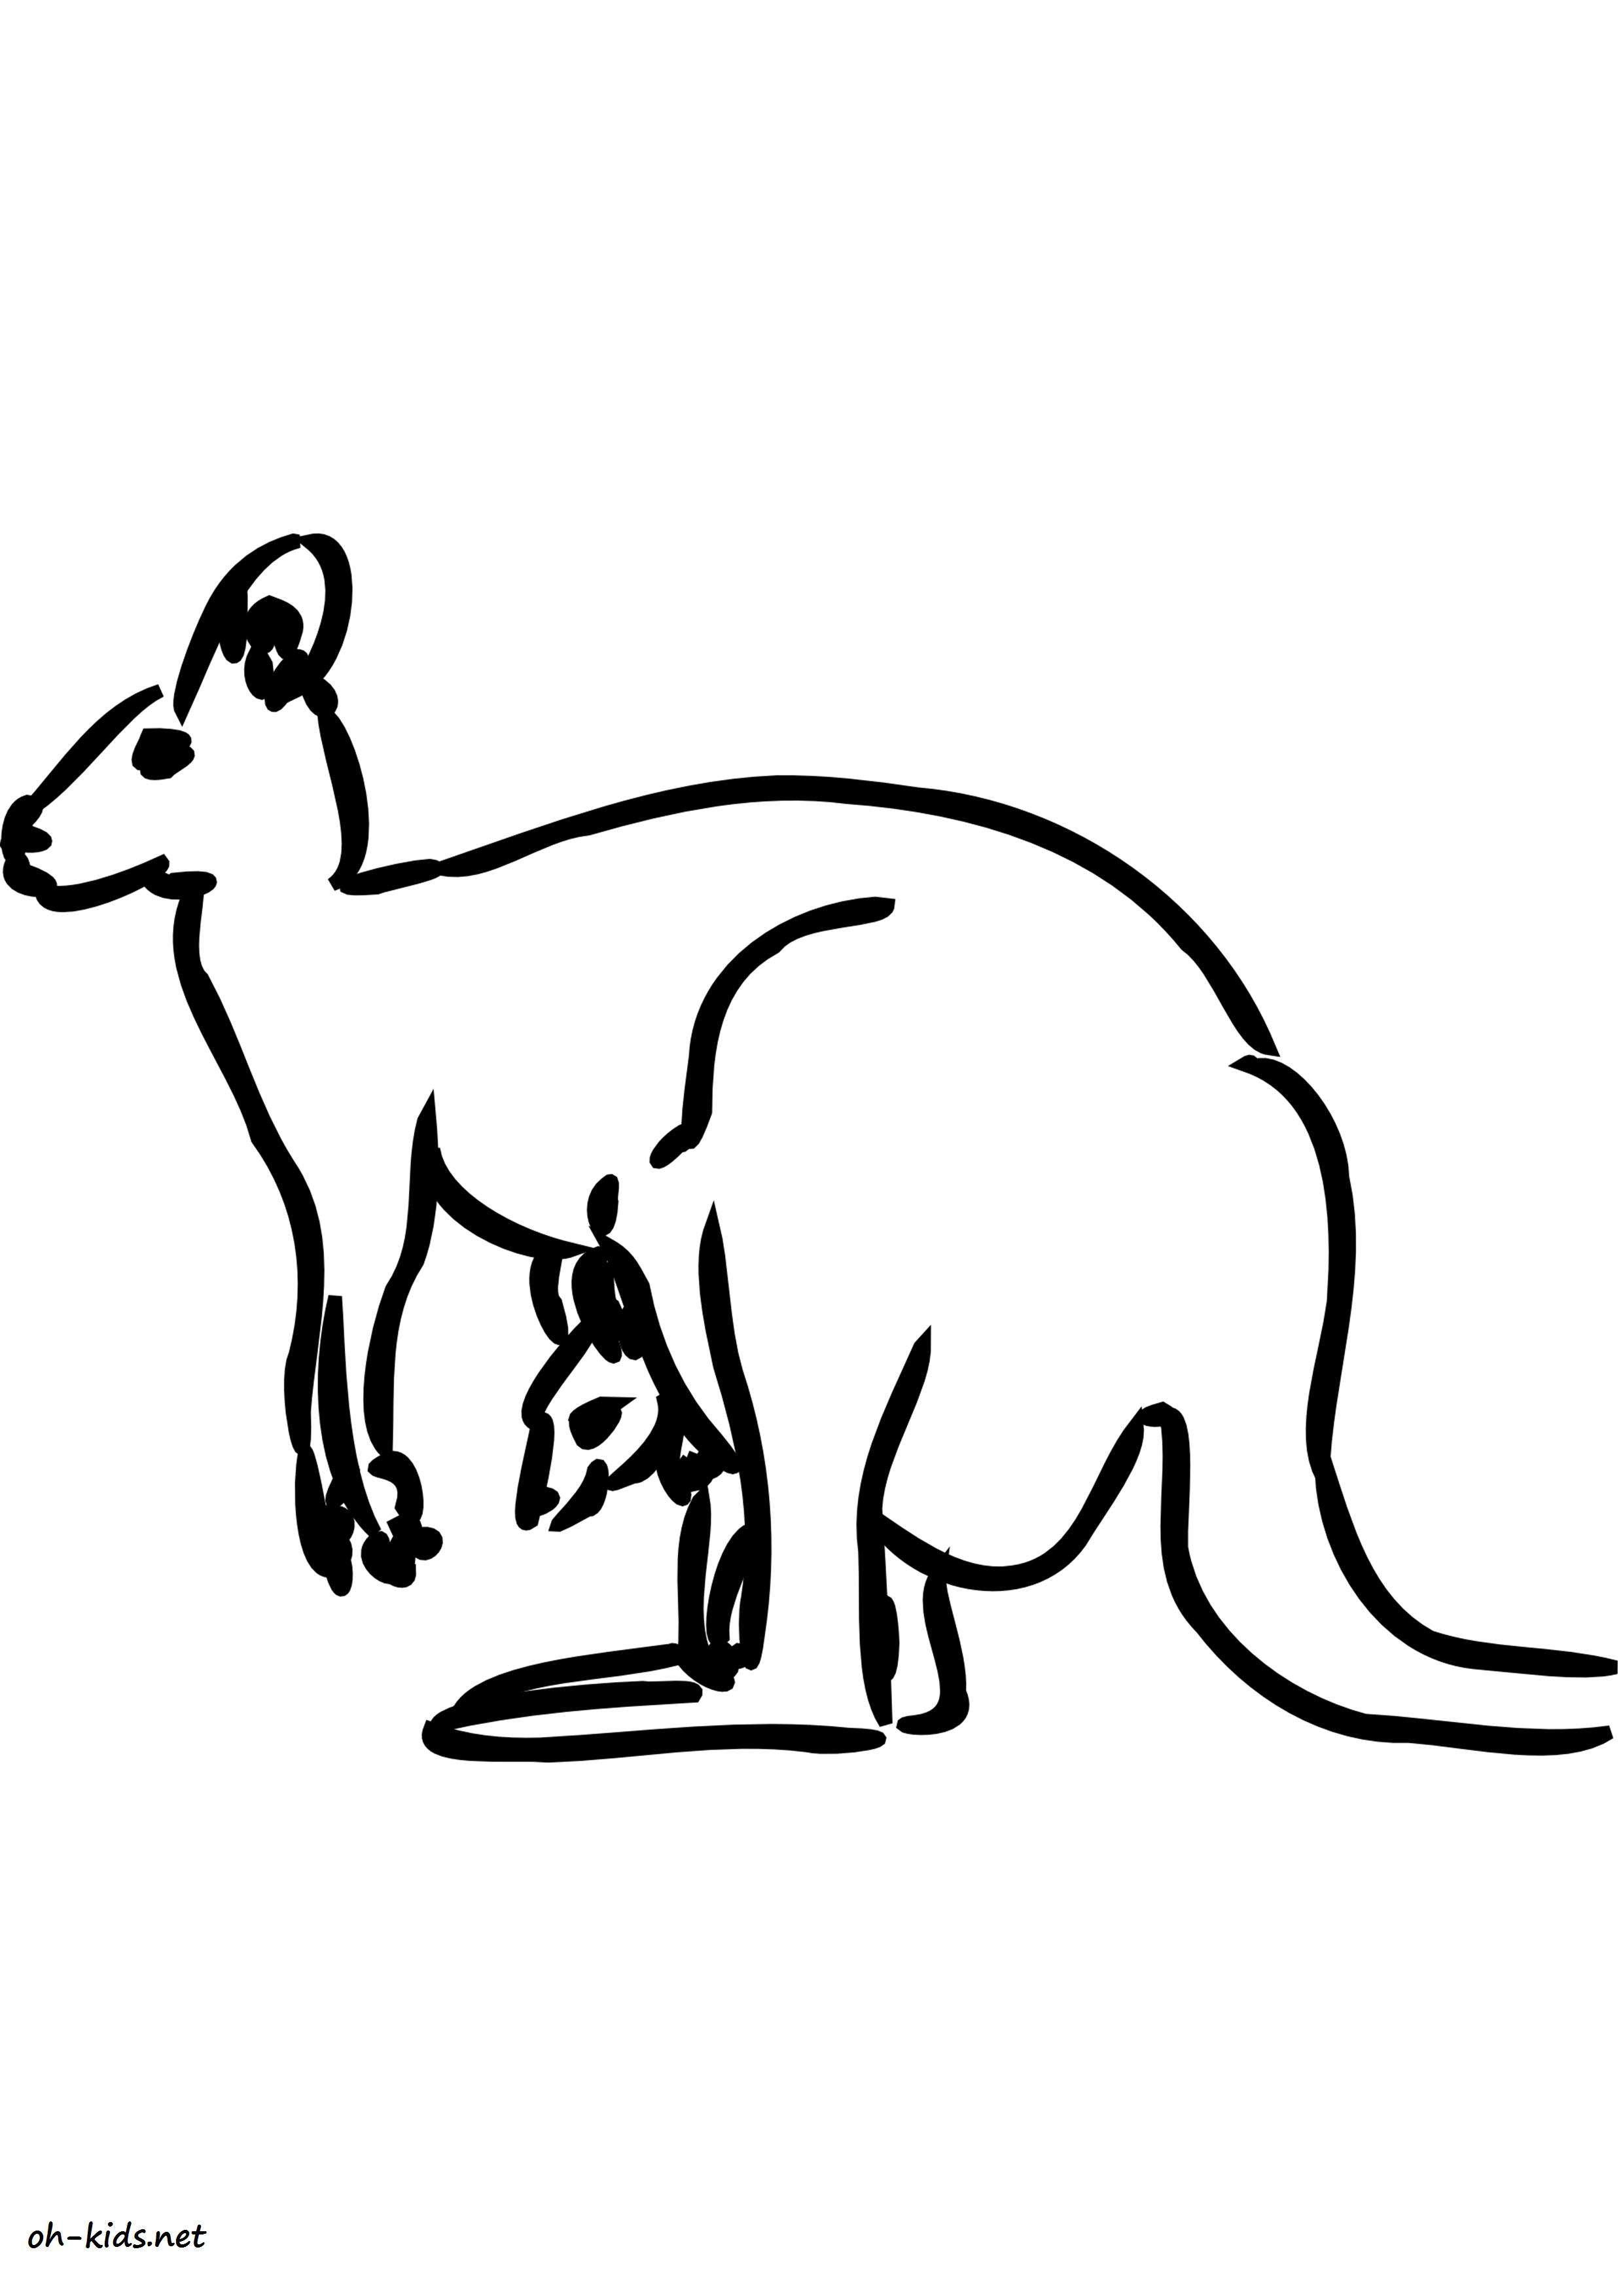 Image de kangourou a colorier - Dessin #1627